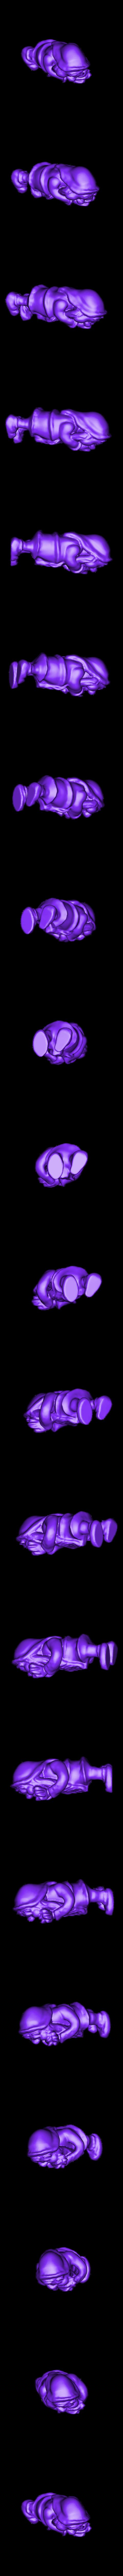 Sleepy.stl Download free STL file Dwarfs - Sleepy • 3D print template, quangdo1700